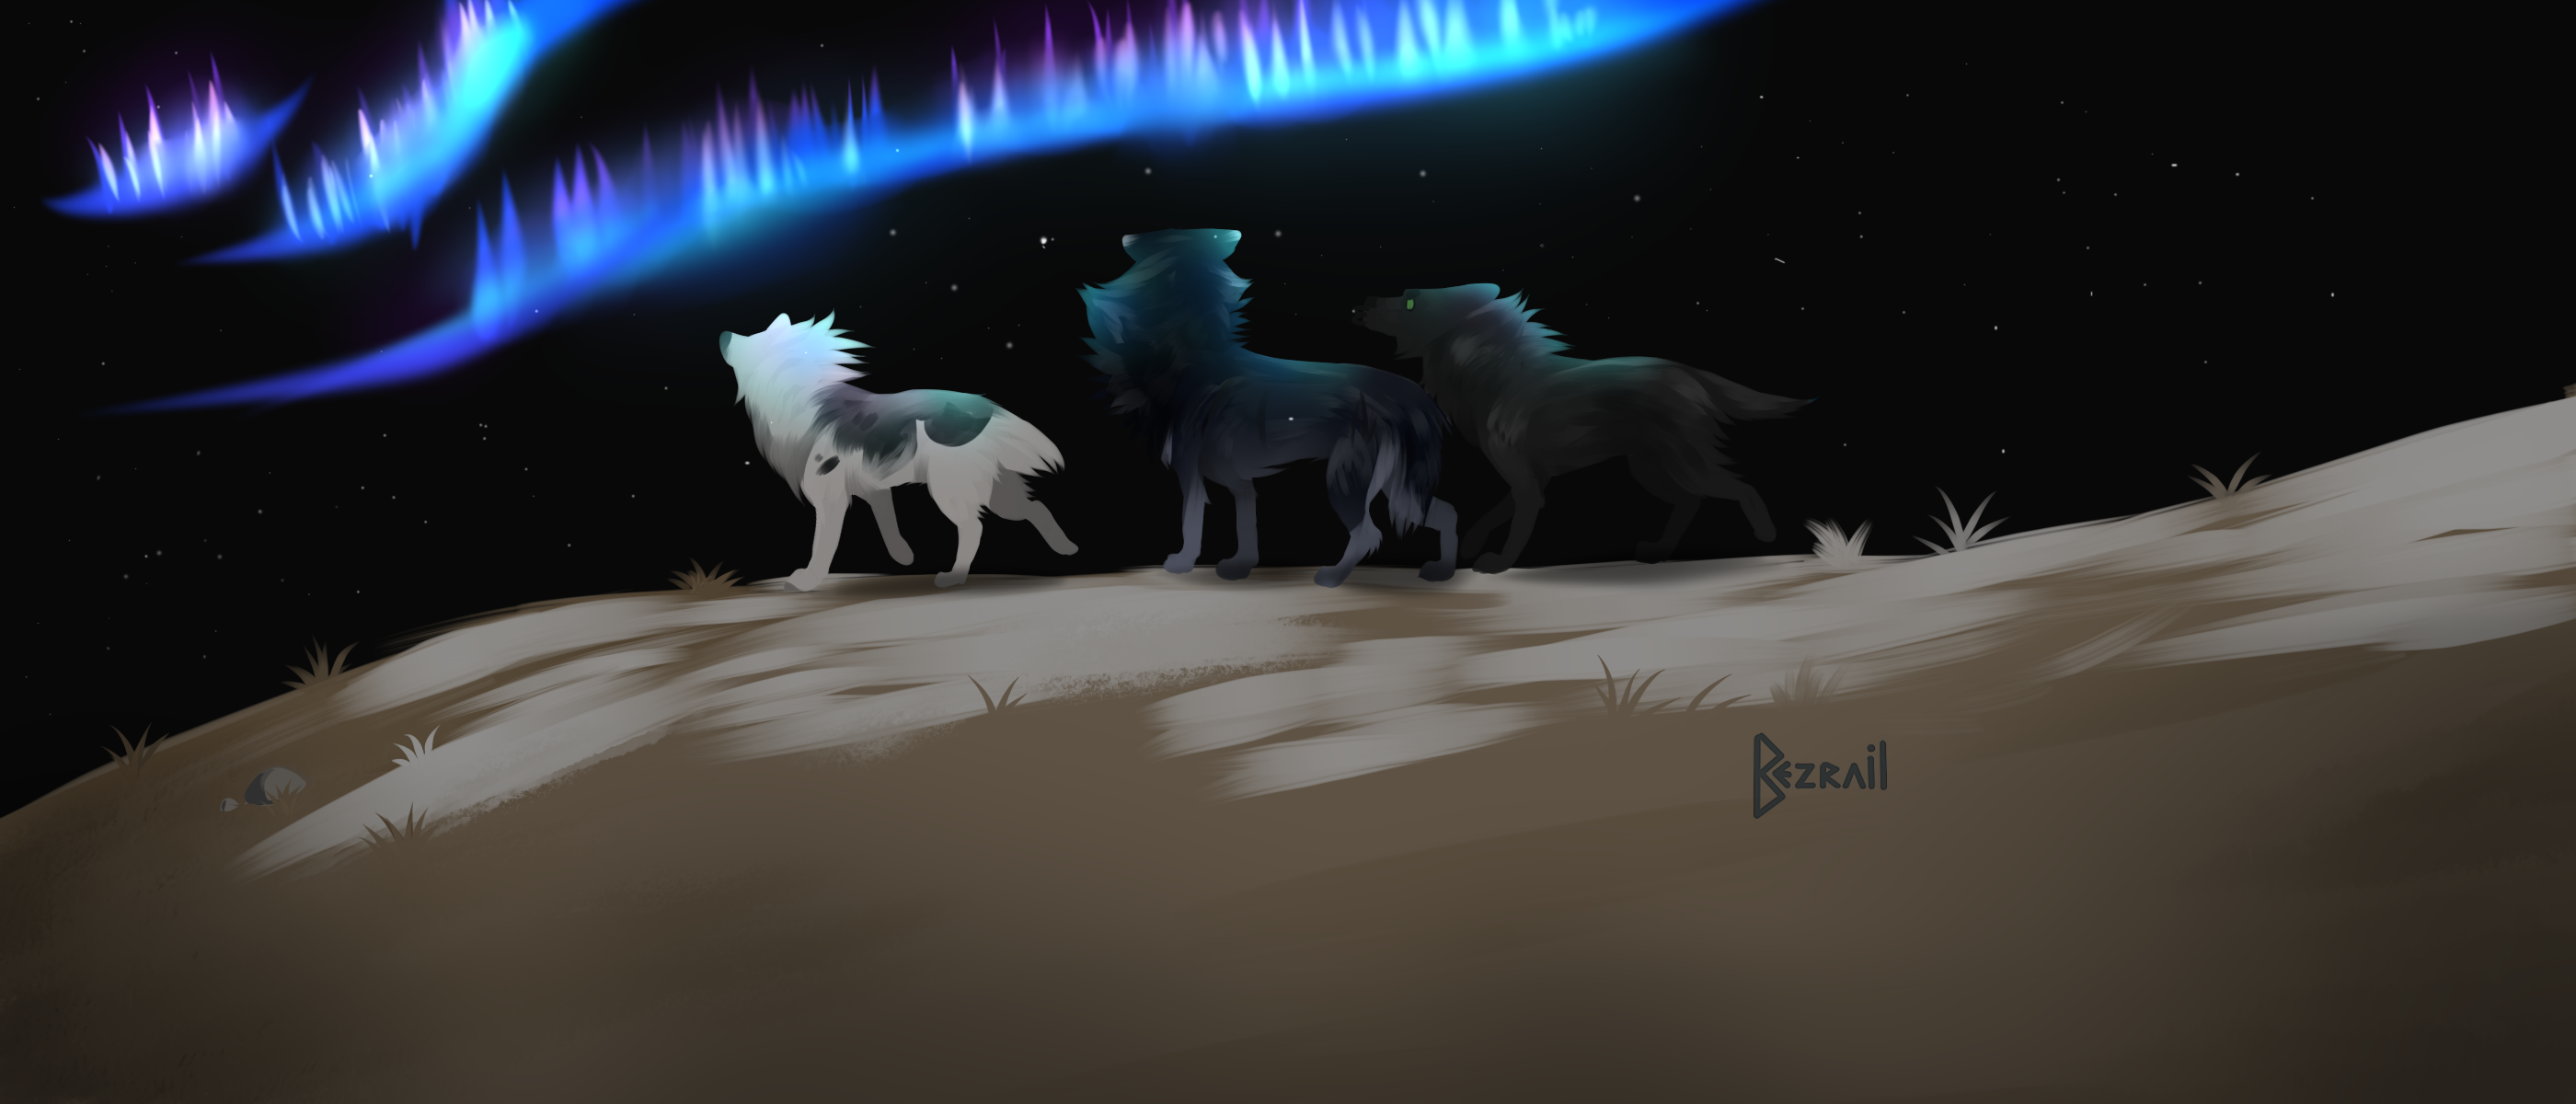 RoF - 'Auroras' by Bezrail